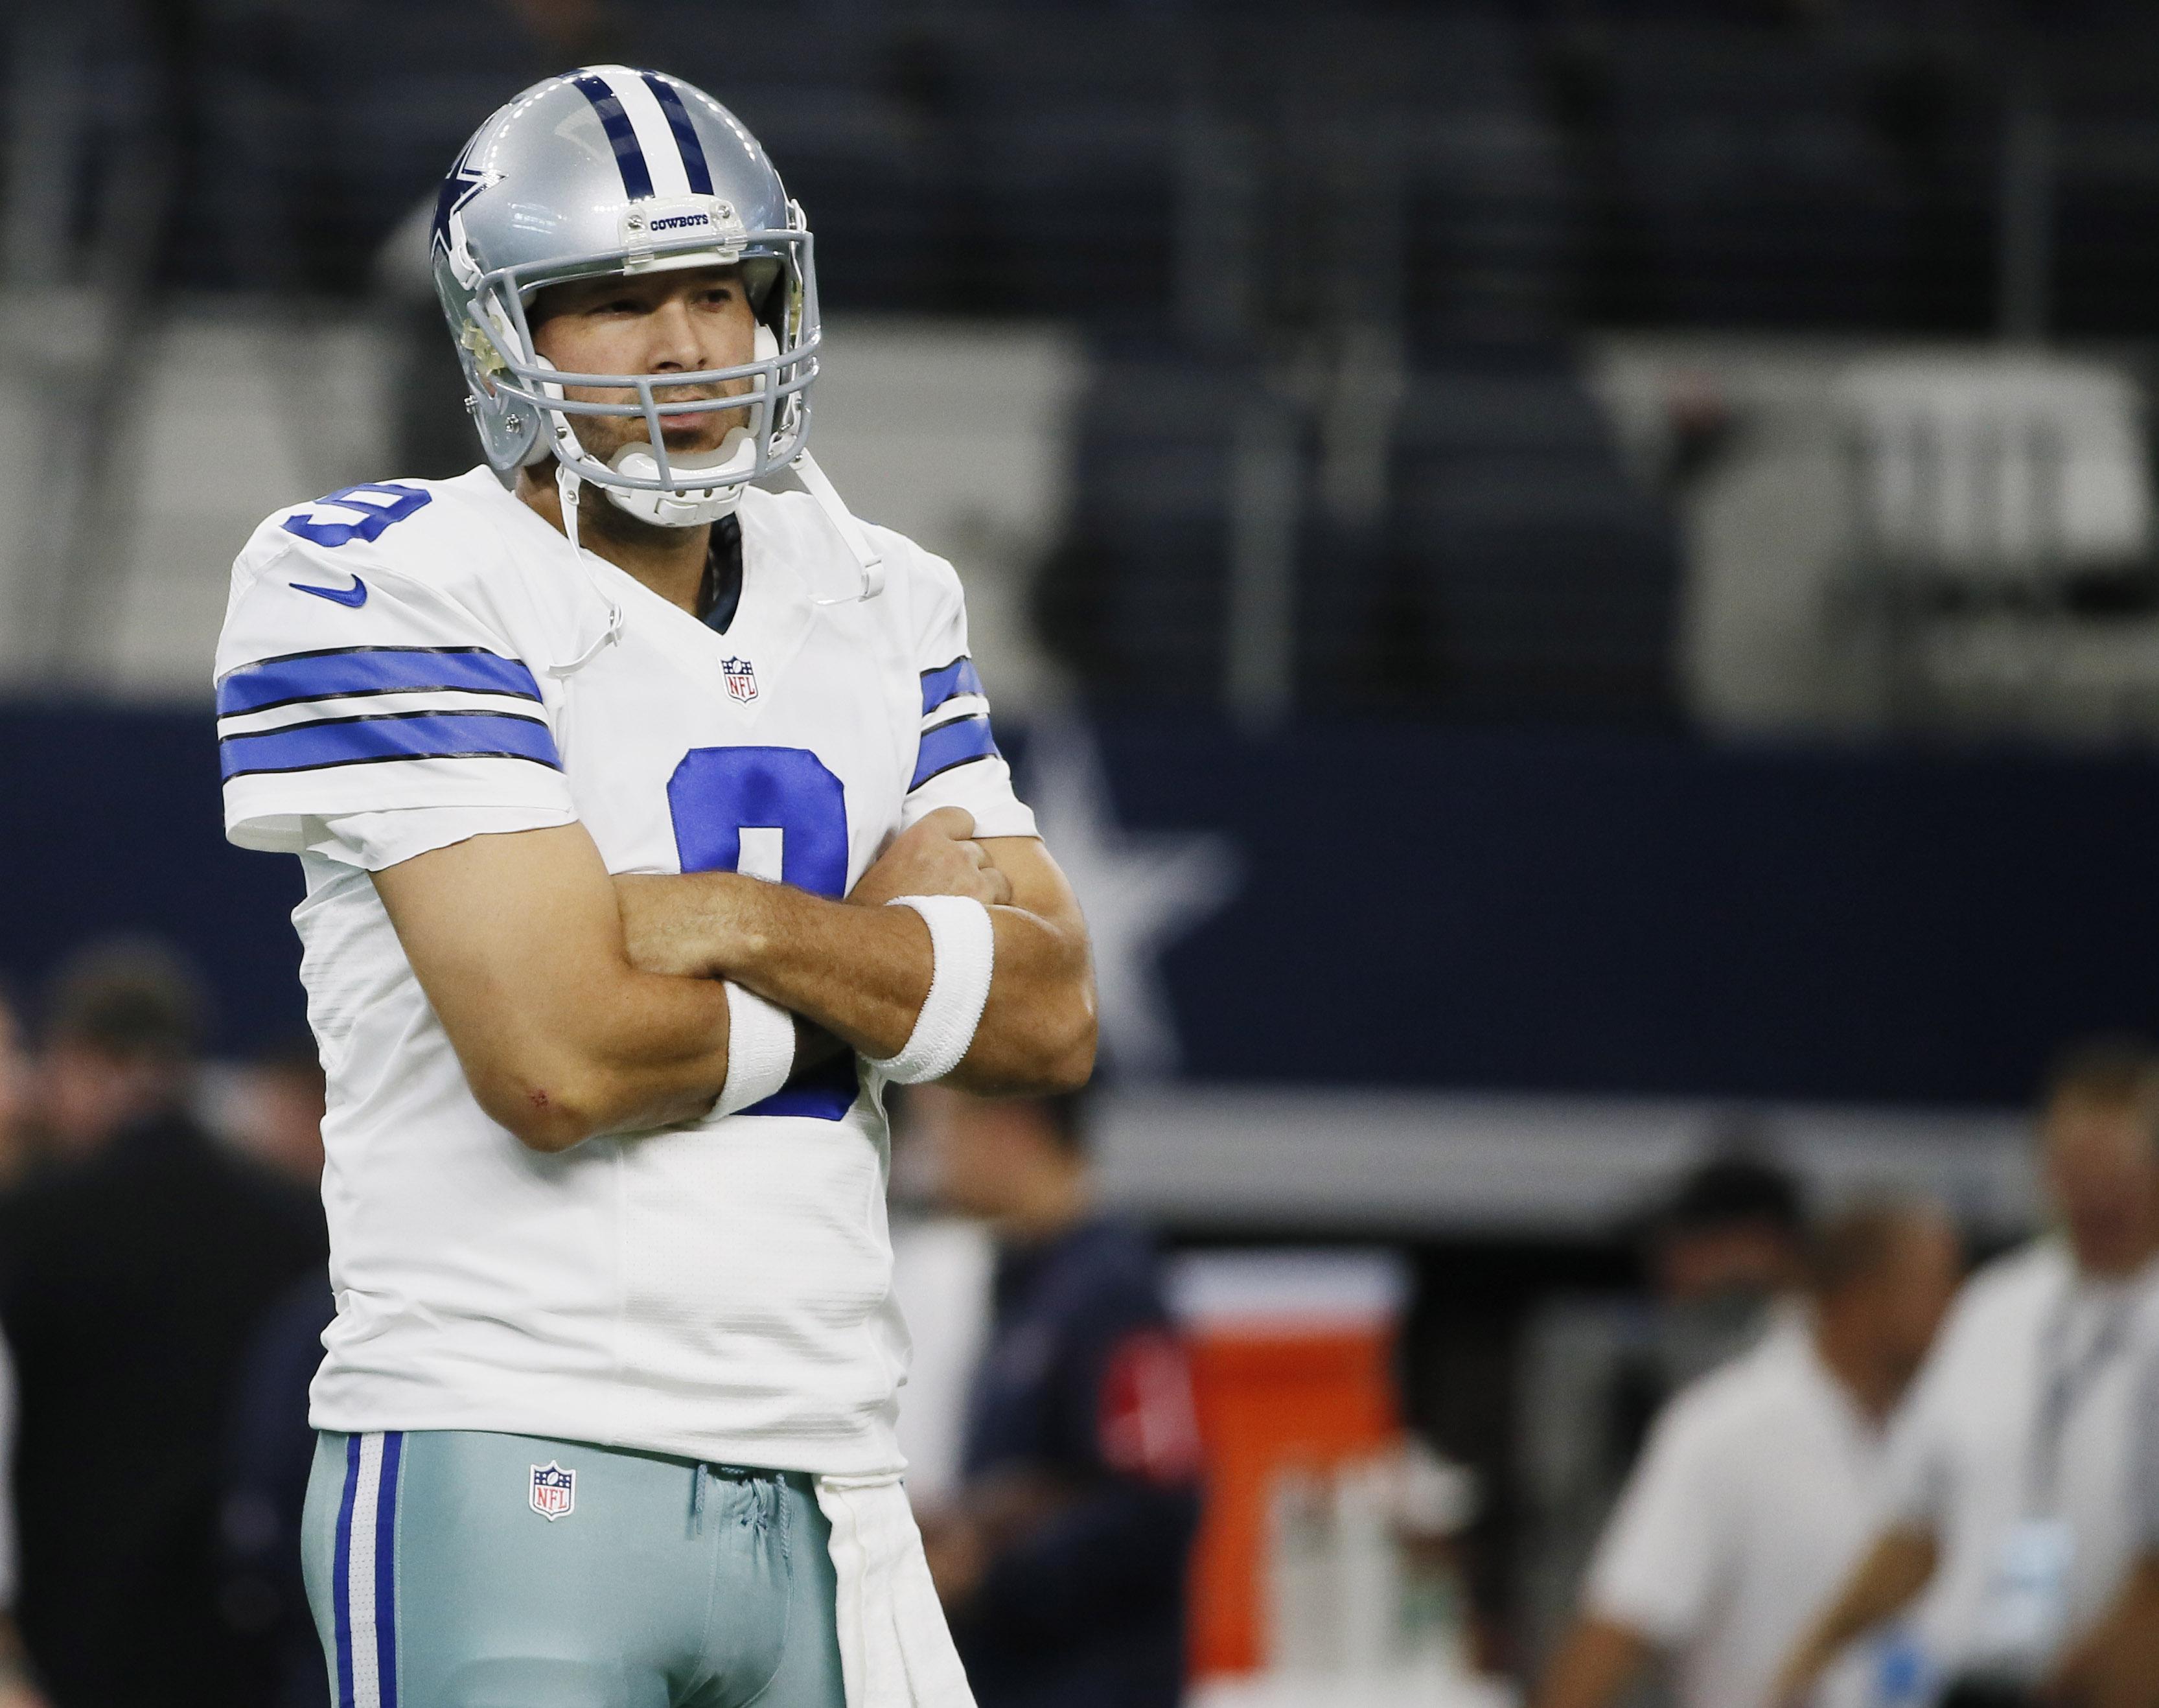 Dallas Cowboys quarterback Tony Romo (9) watches the team warm up before a preseason NFL football game against the Houston Texans, Thursday, Sept. 3, 2015, in Arlington, Texas. (AP Photo/Tony Gutierrez)